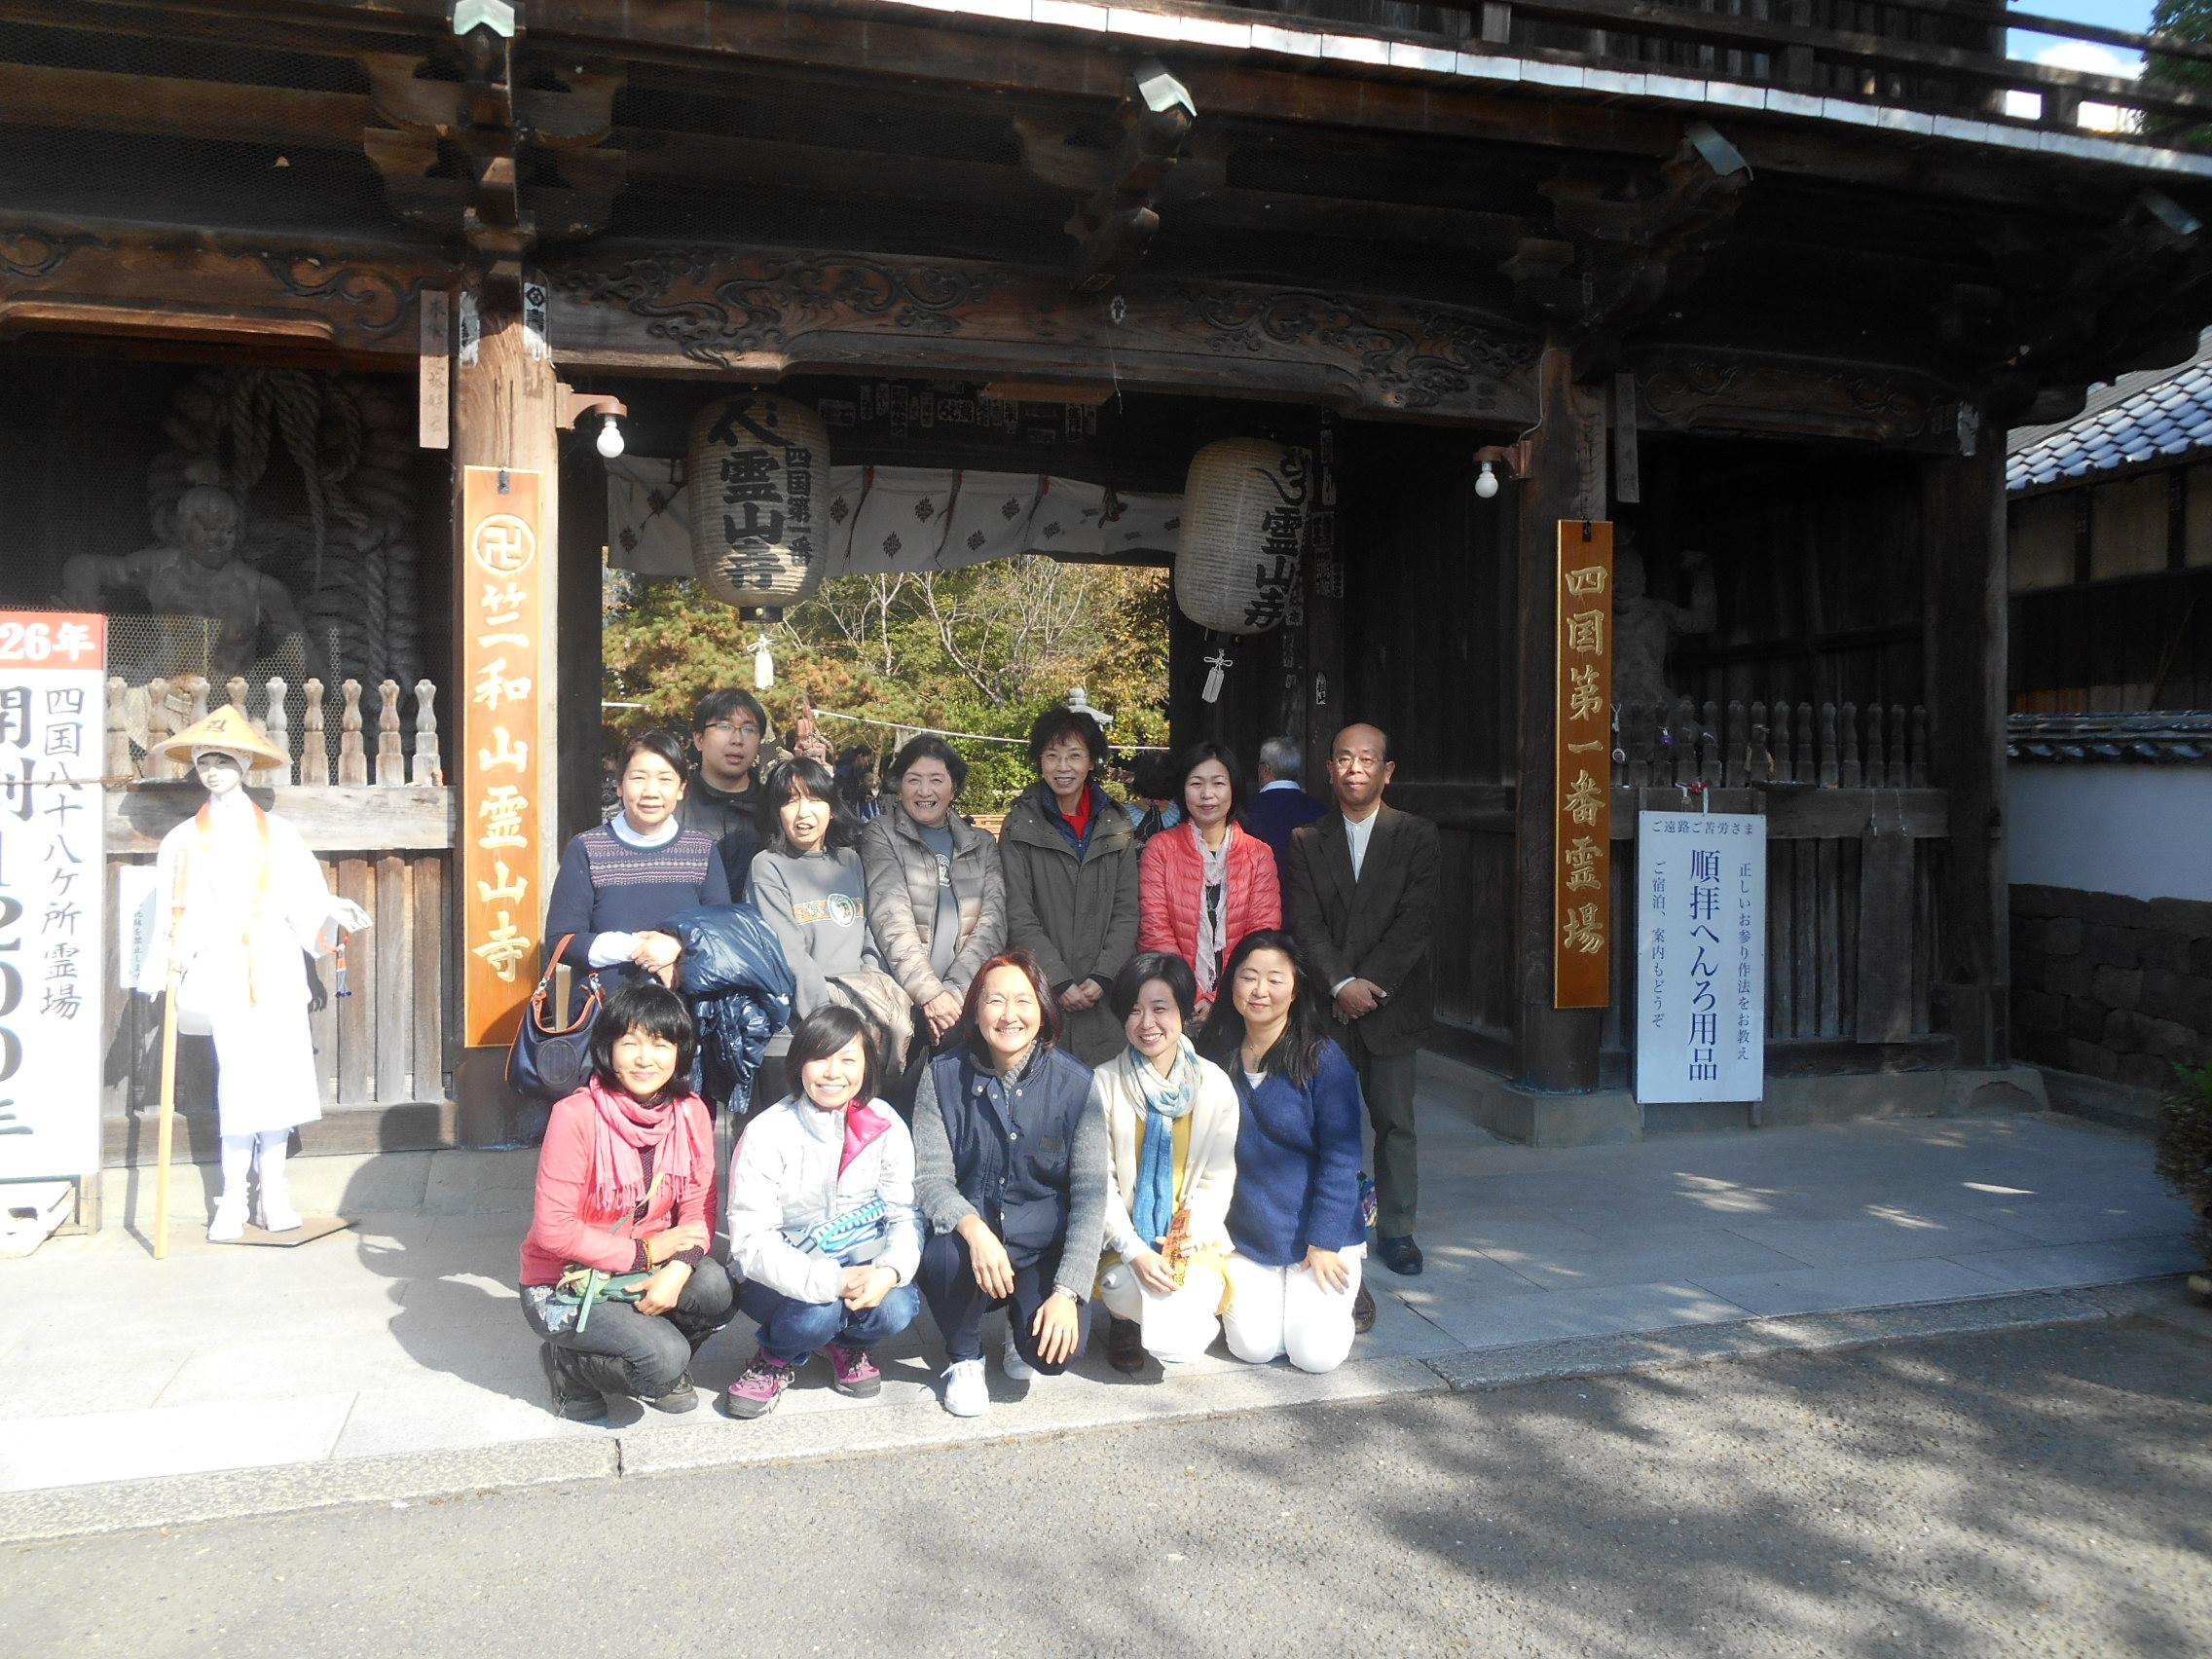 DSCN2170 - 春分の阿波忌部女神ツアー